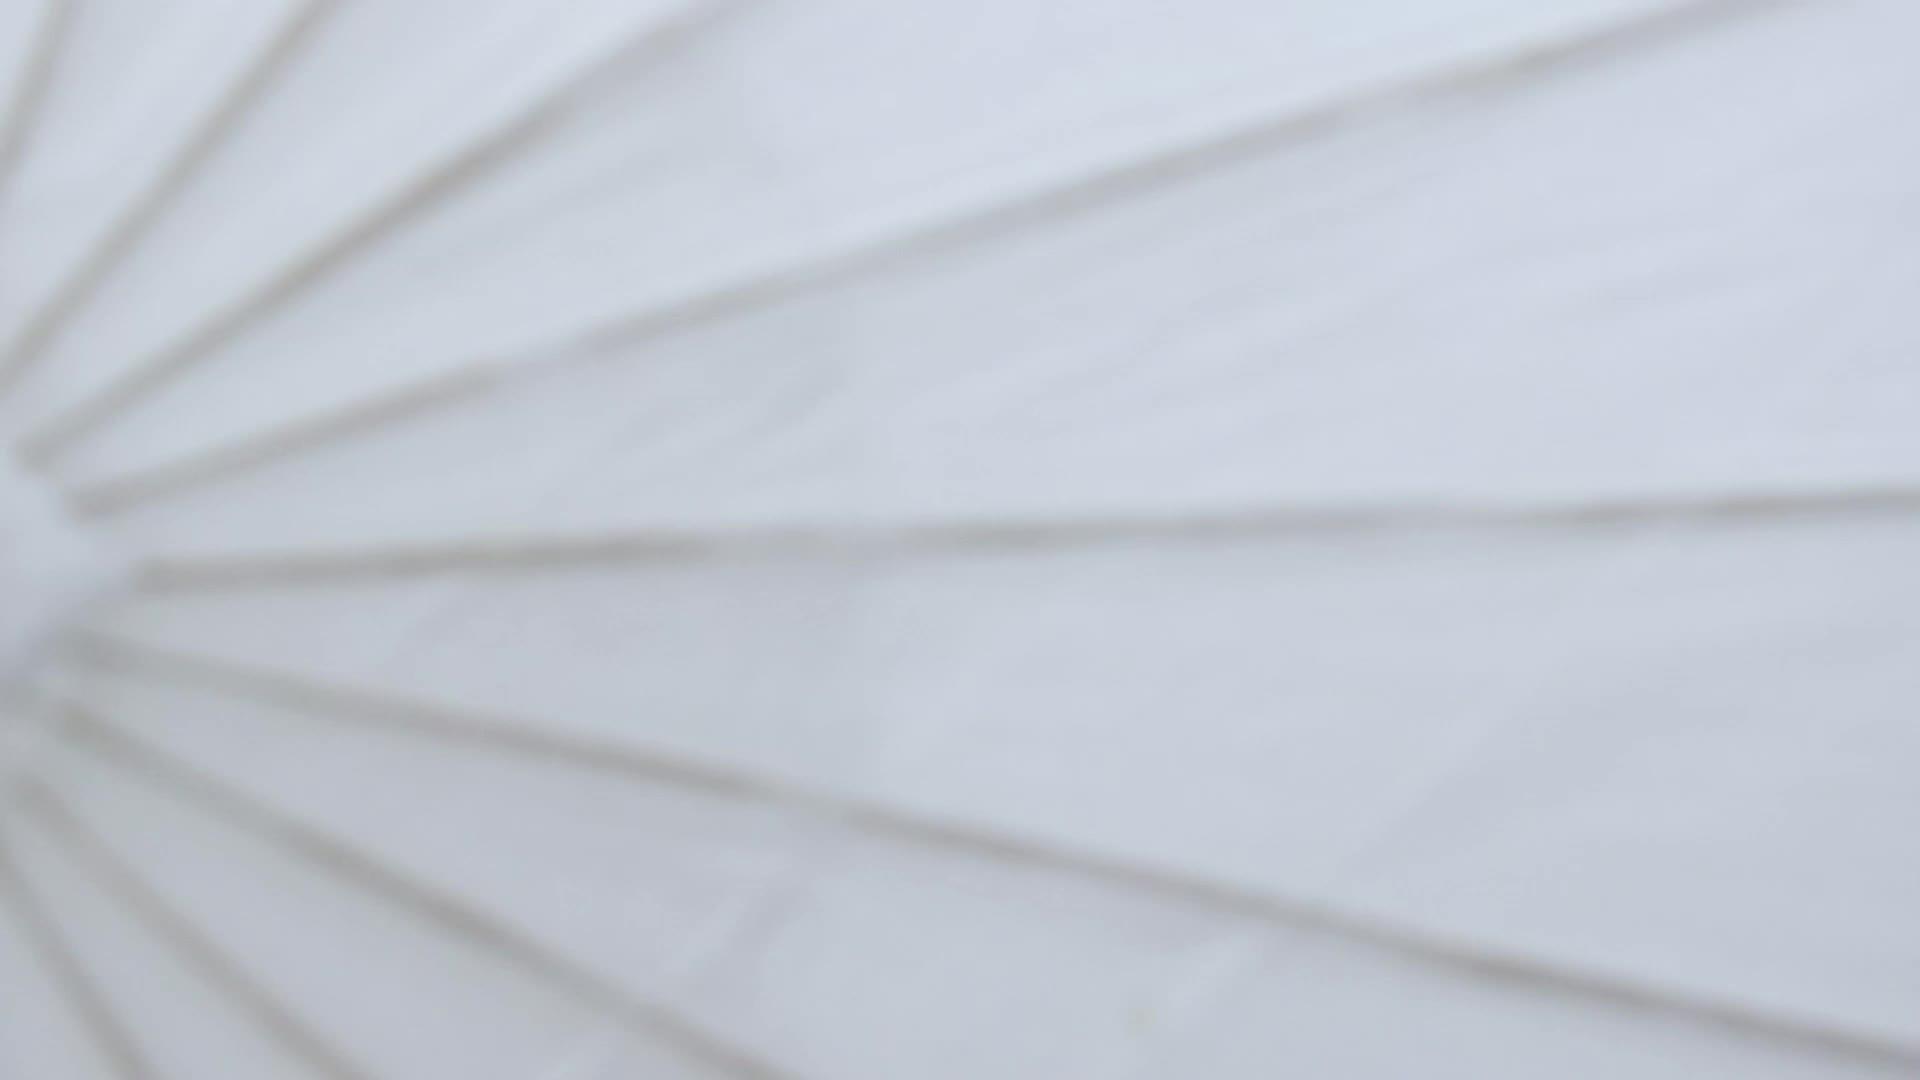 Payung Kertas Minyak Populer Warna-warni Payung Cina untuk Dekorasi Desain Payung Kertas